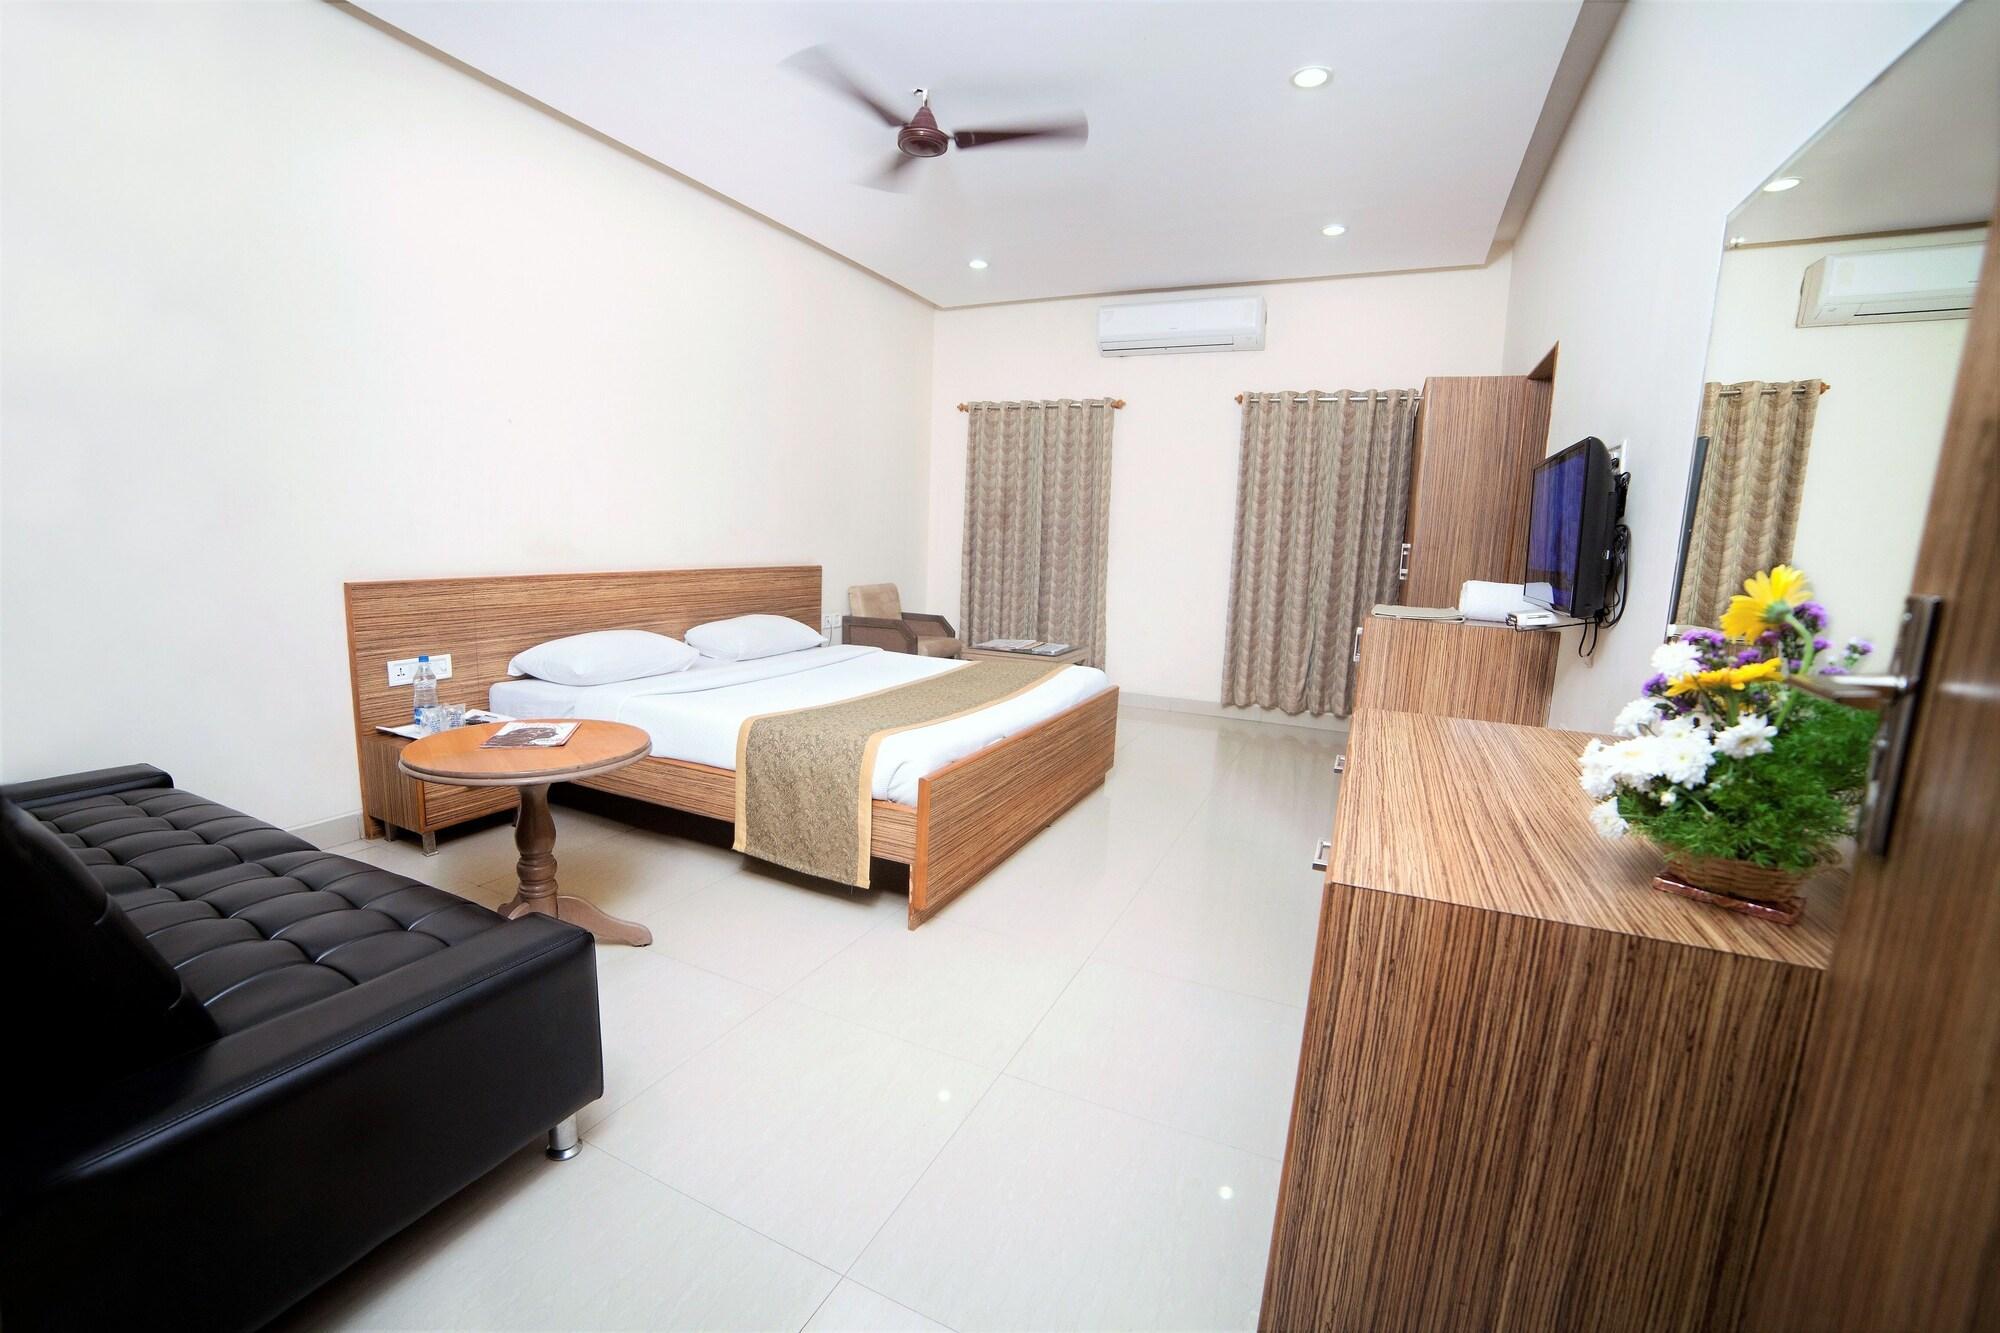 Taj Mahal Hotel Abids Aed 78 A E D 1 1 8 Hyderabad